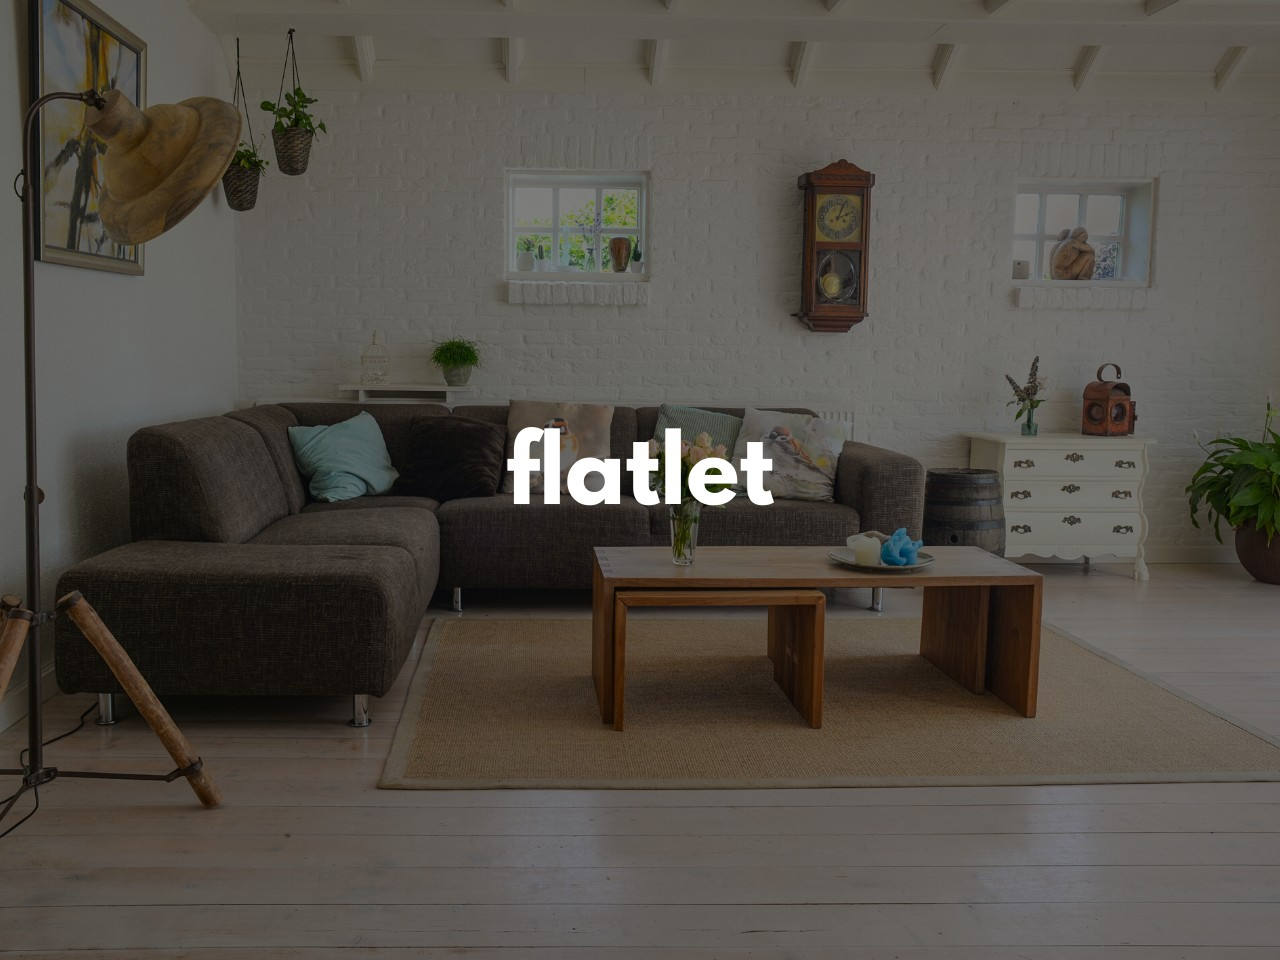 flatlet : 小さい共同住宅